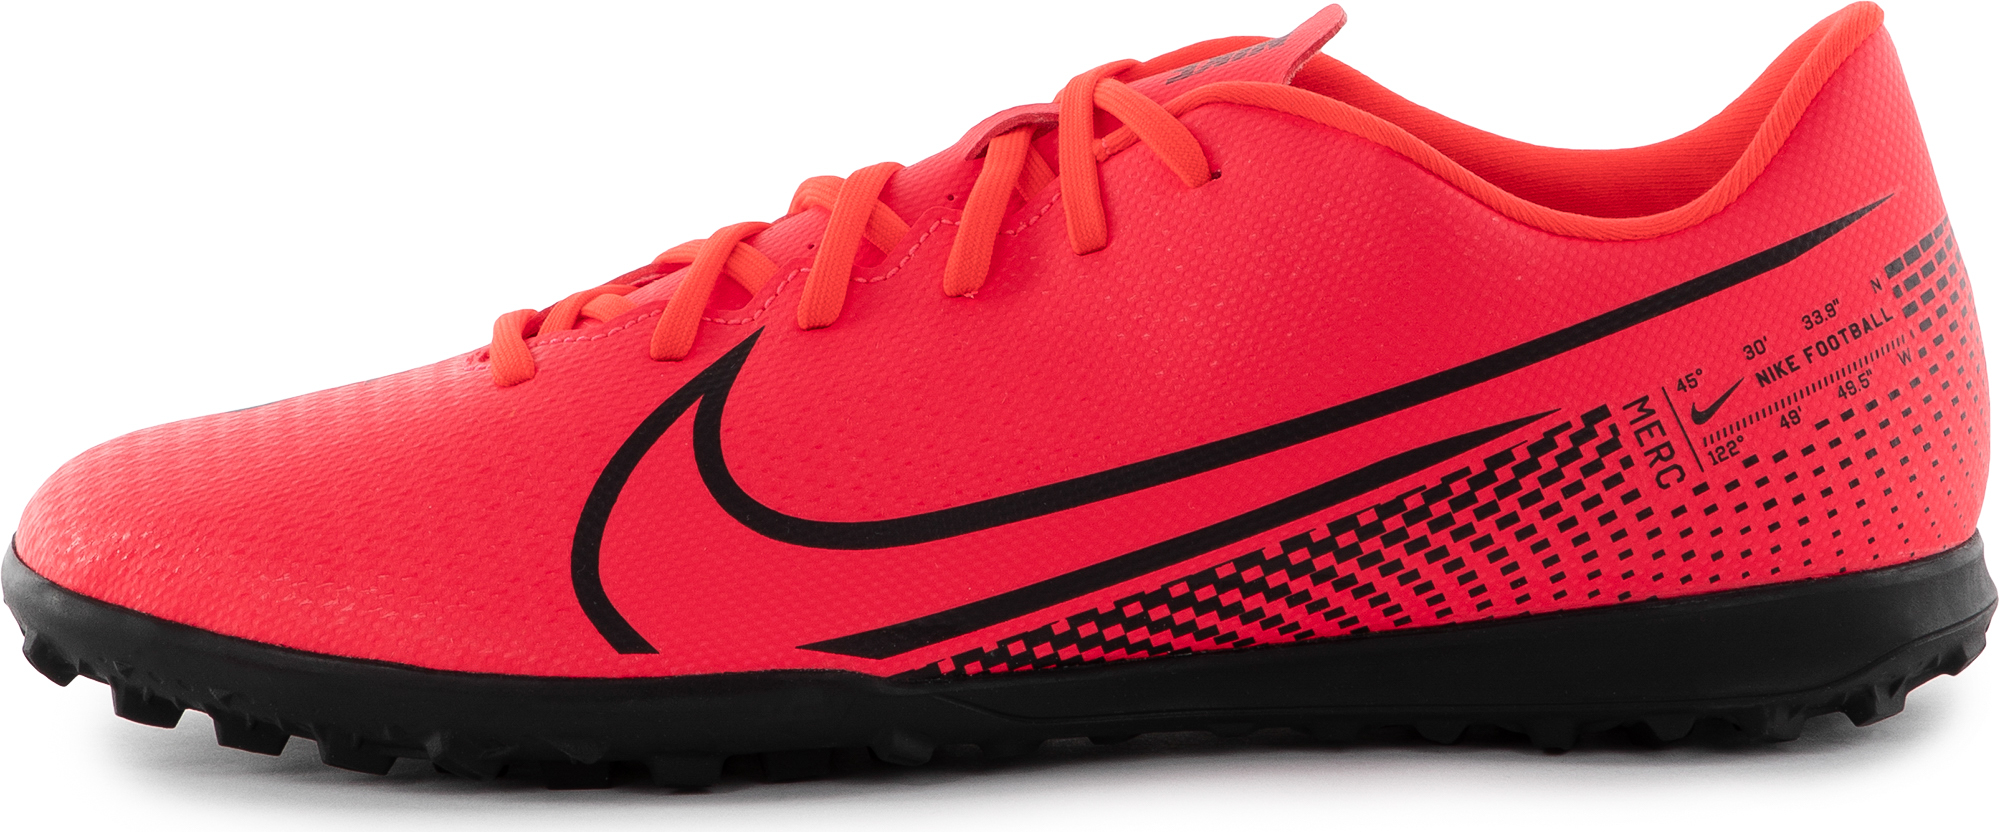 Nike Бутсы мужские Nike Mercurial Vapor 13 Club TF, размер 41.5 рюкзак nike vapor energy ba5538 011